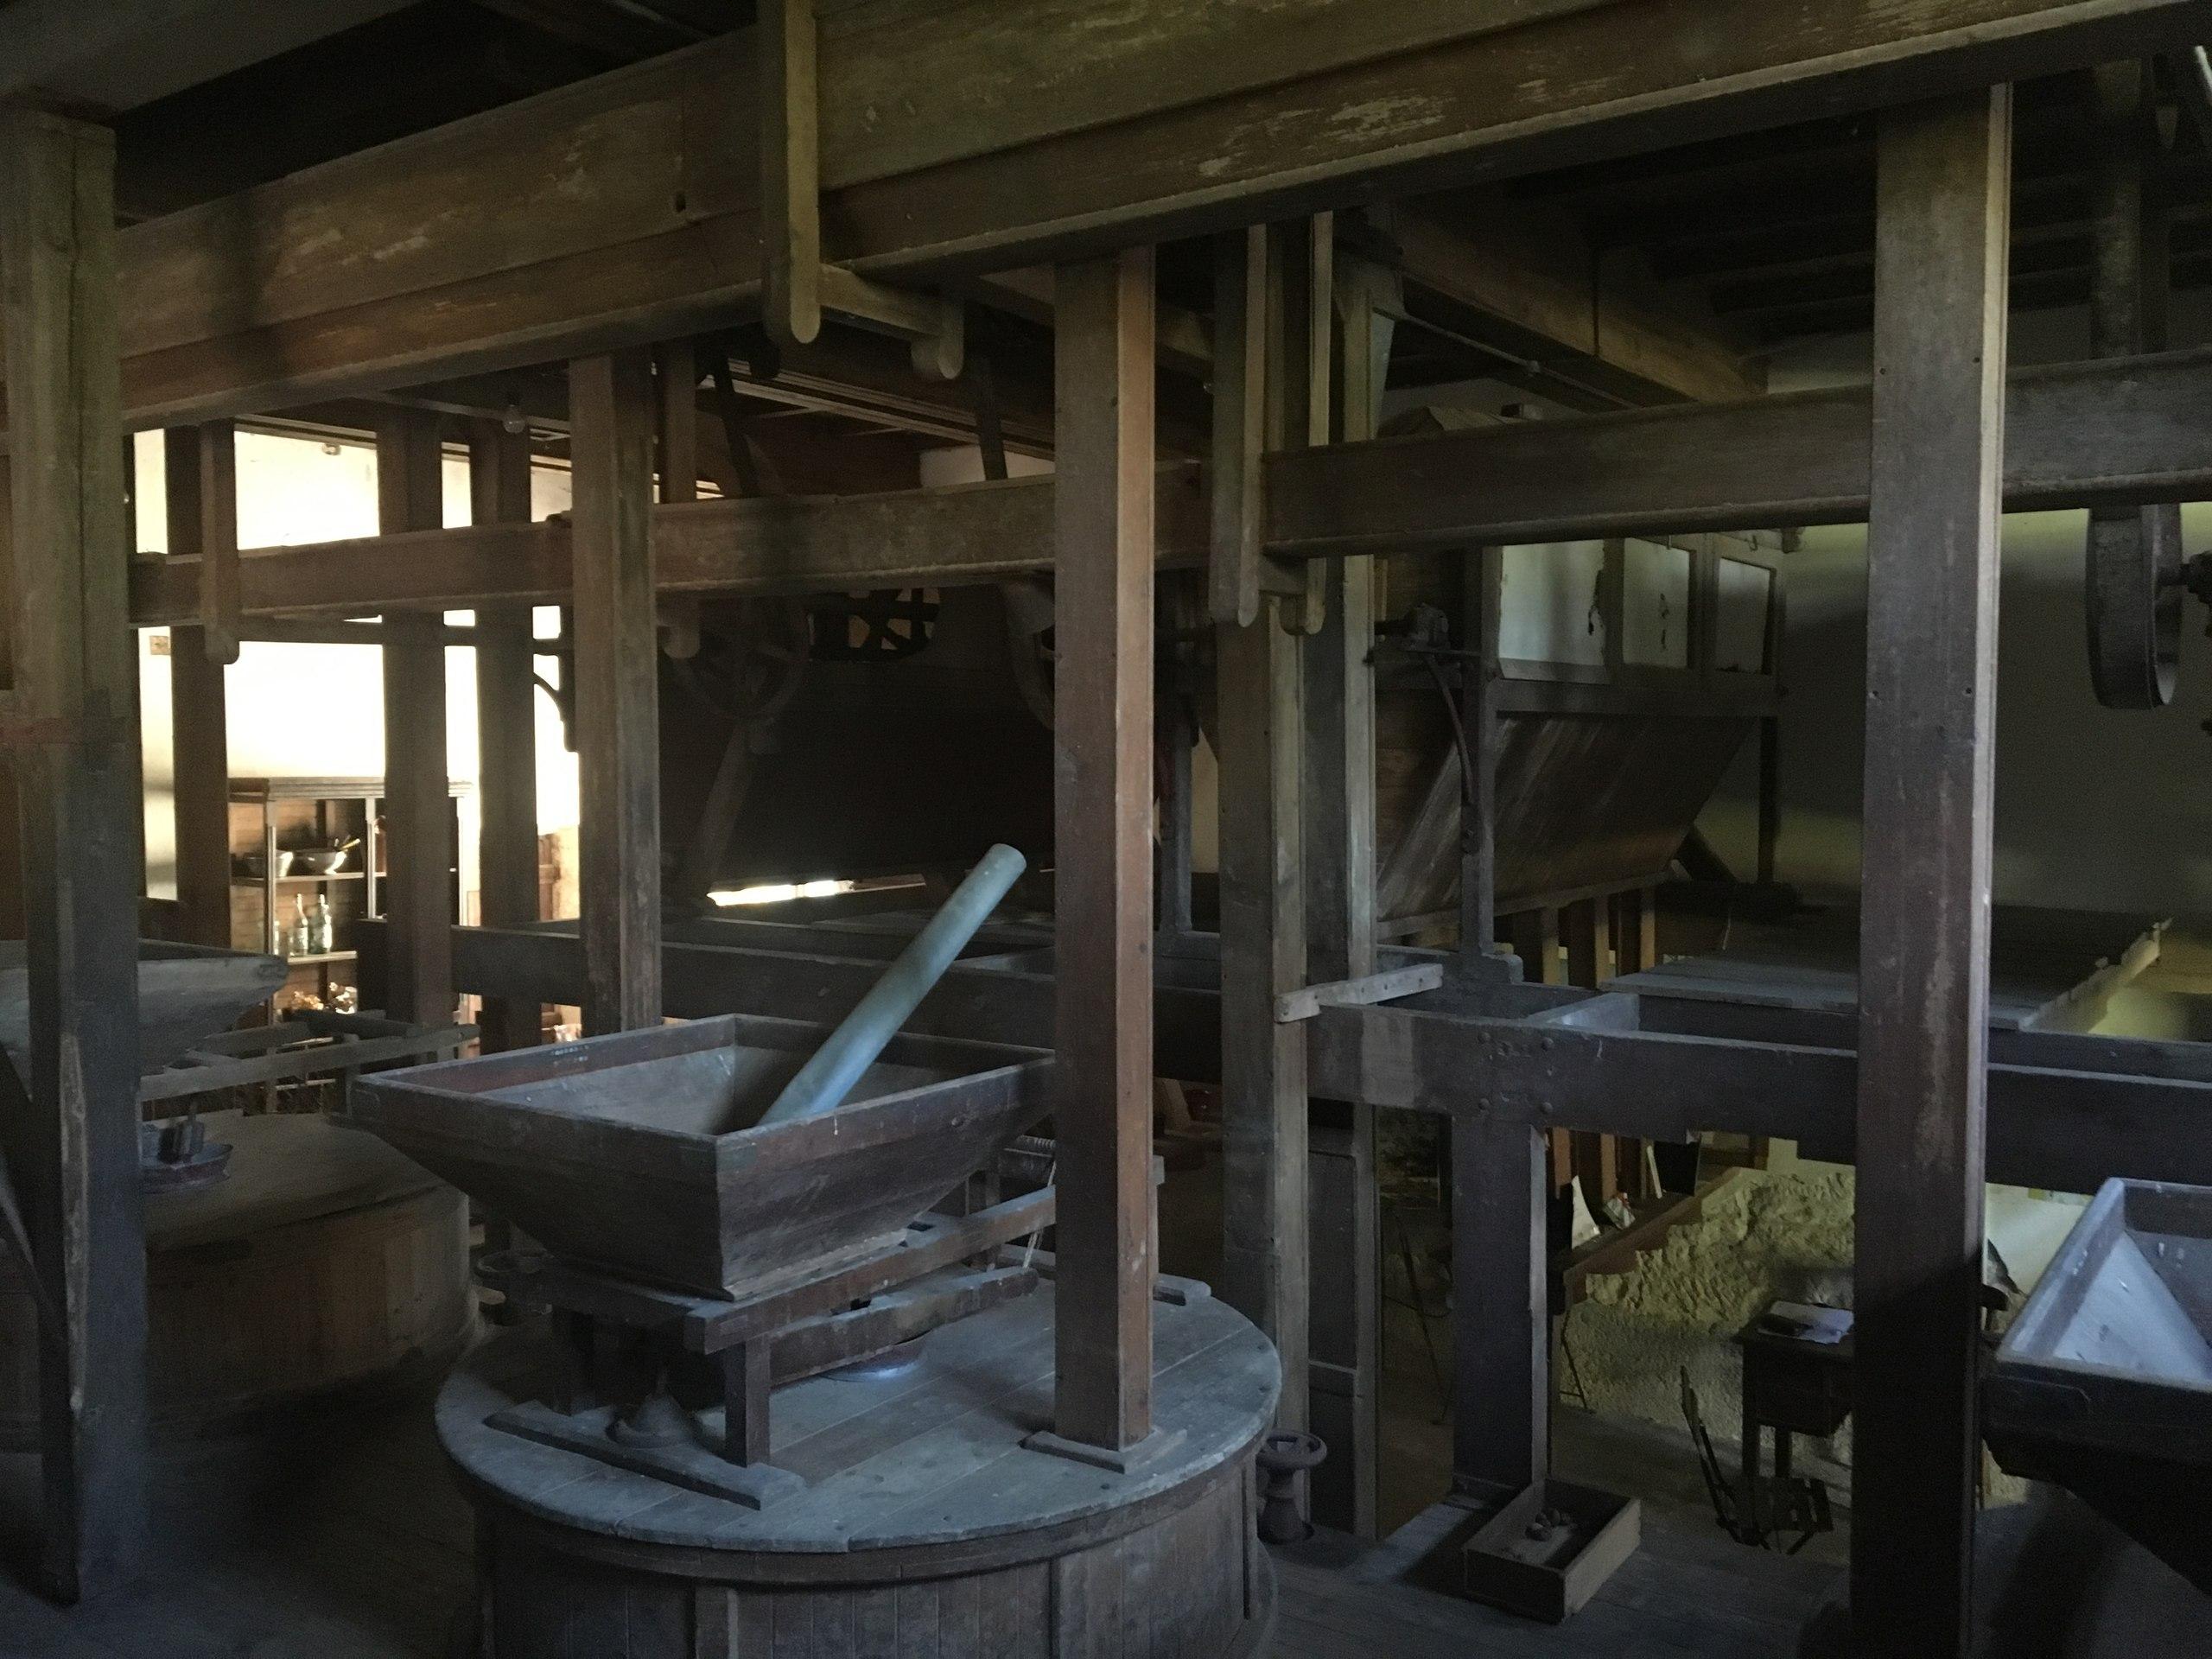 мельница изнутри